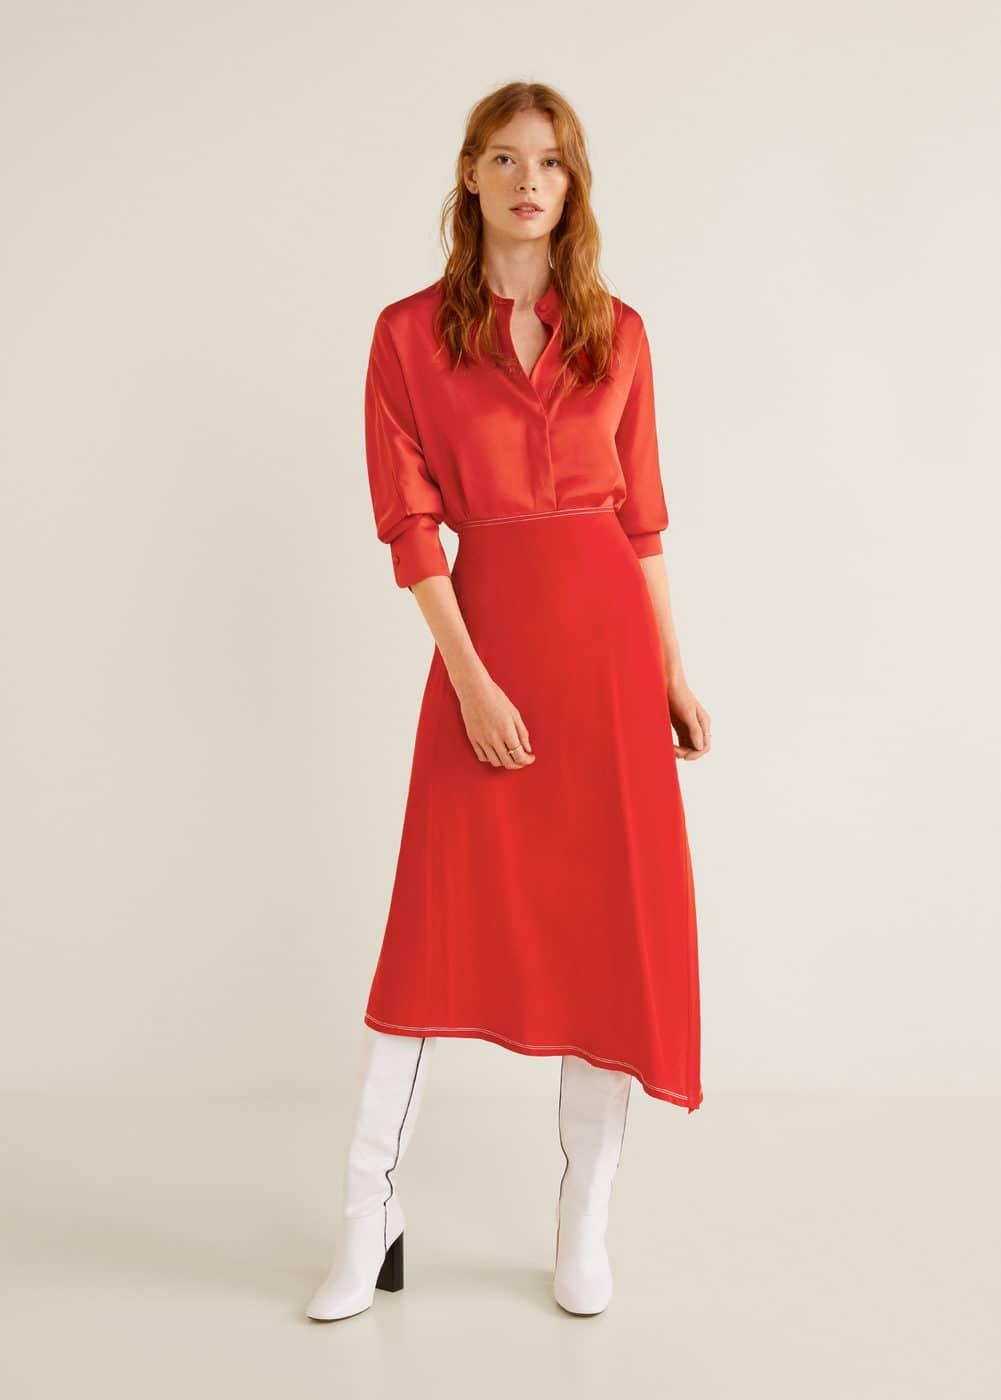 Mango - Satin blouse - 2